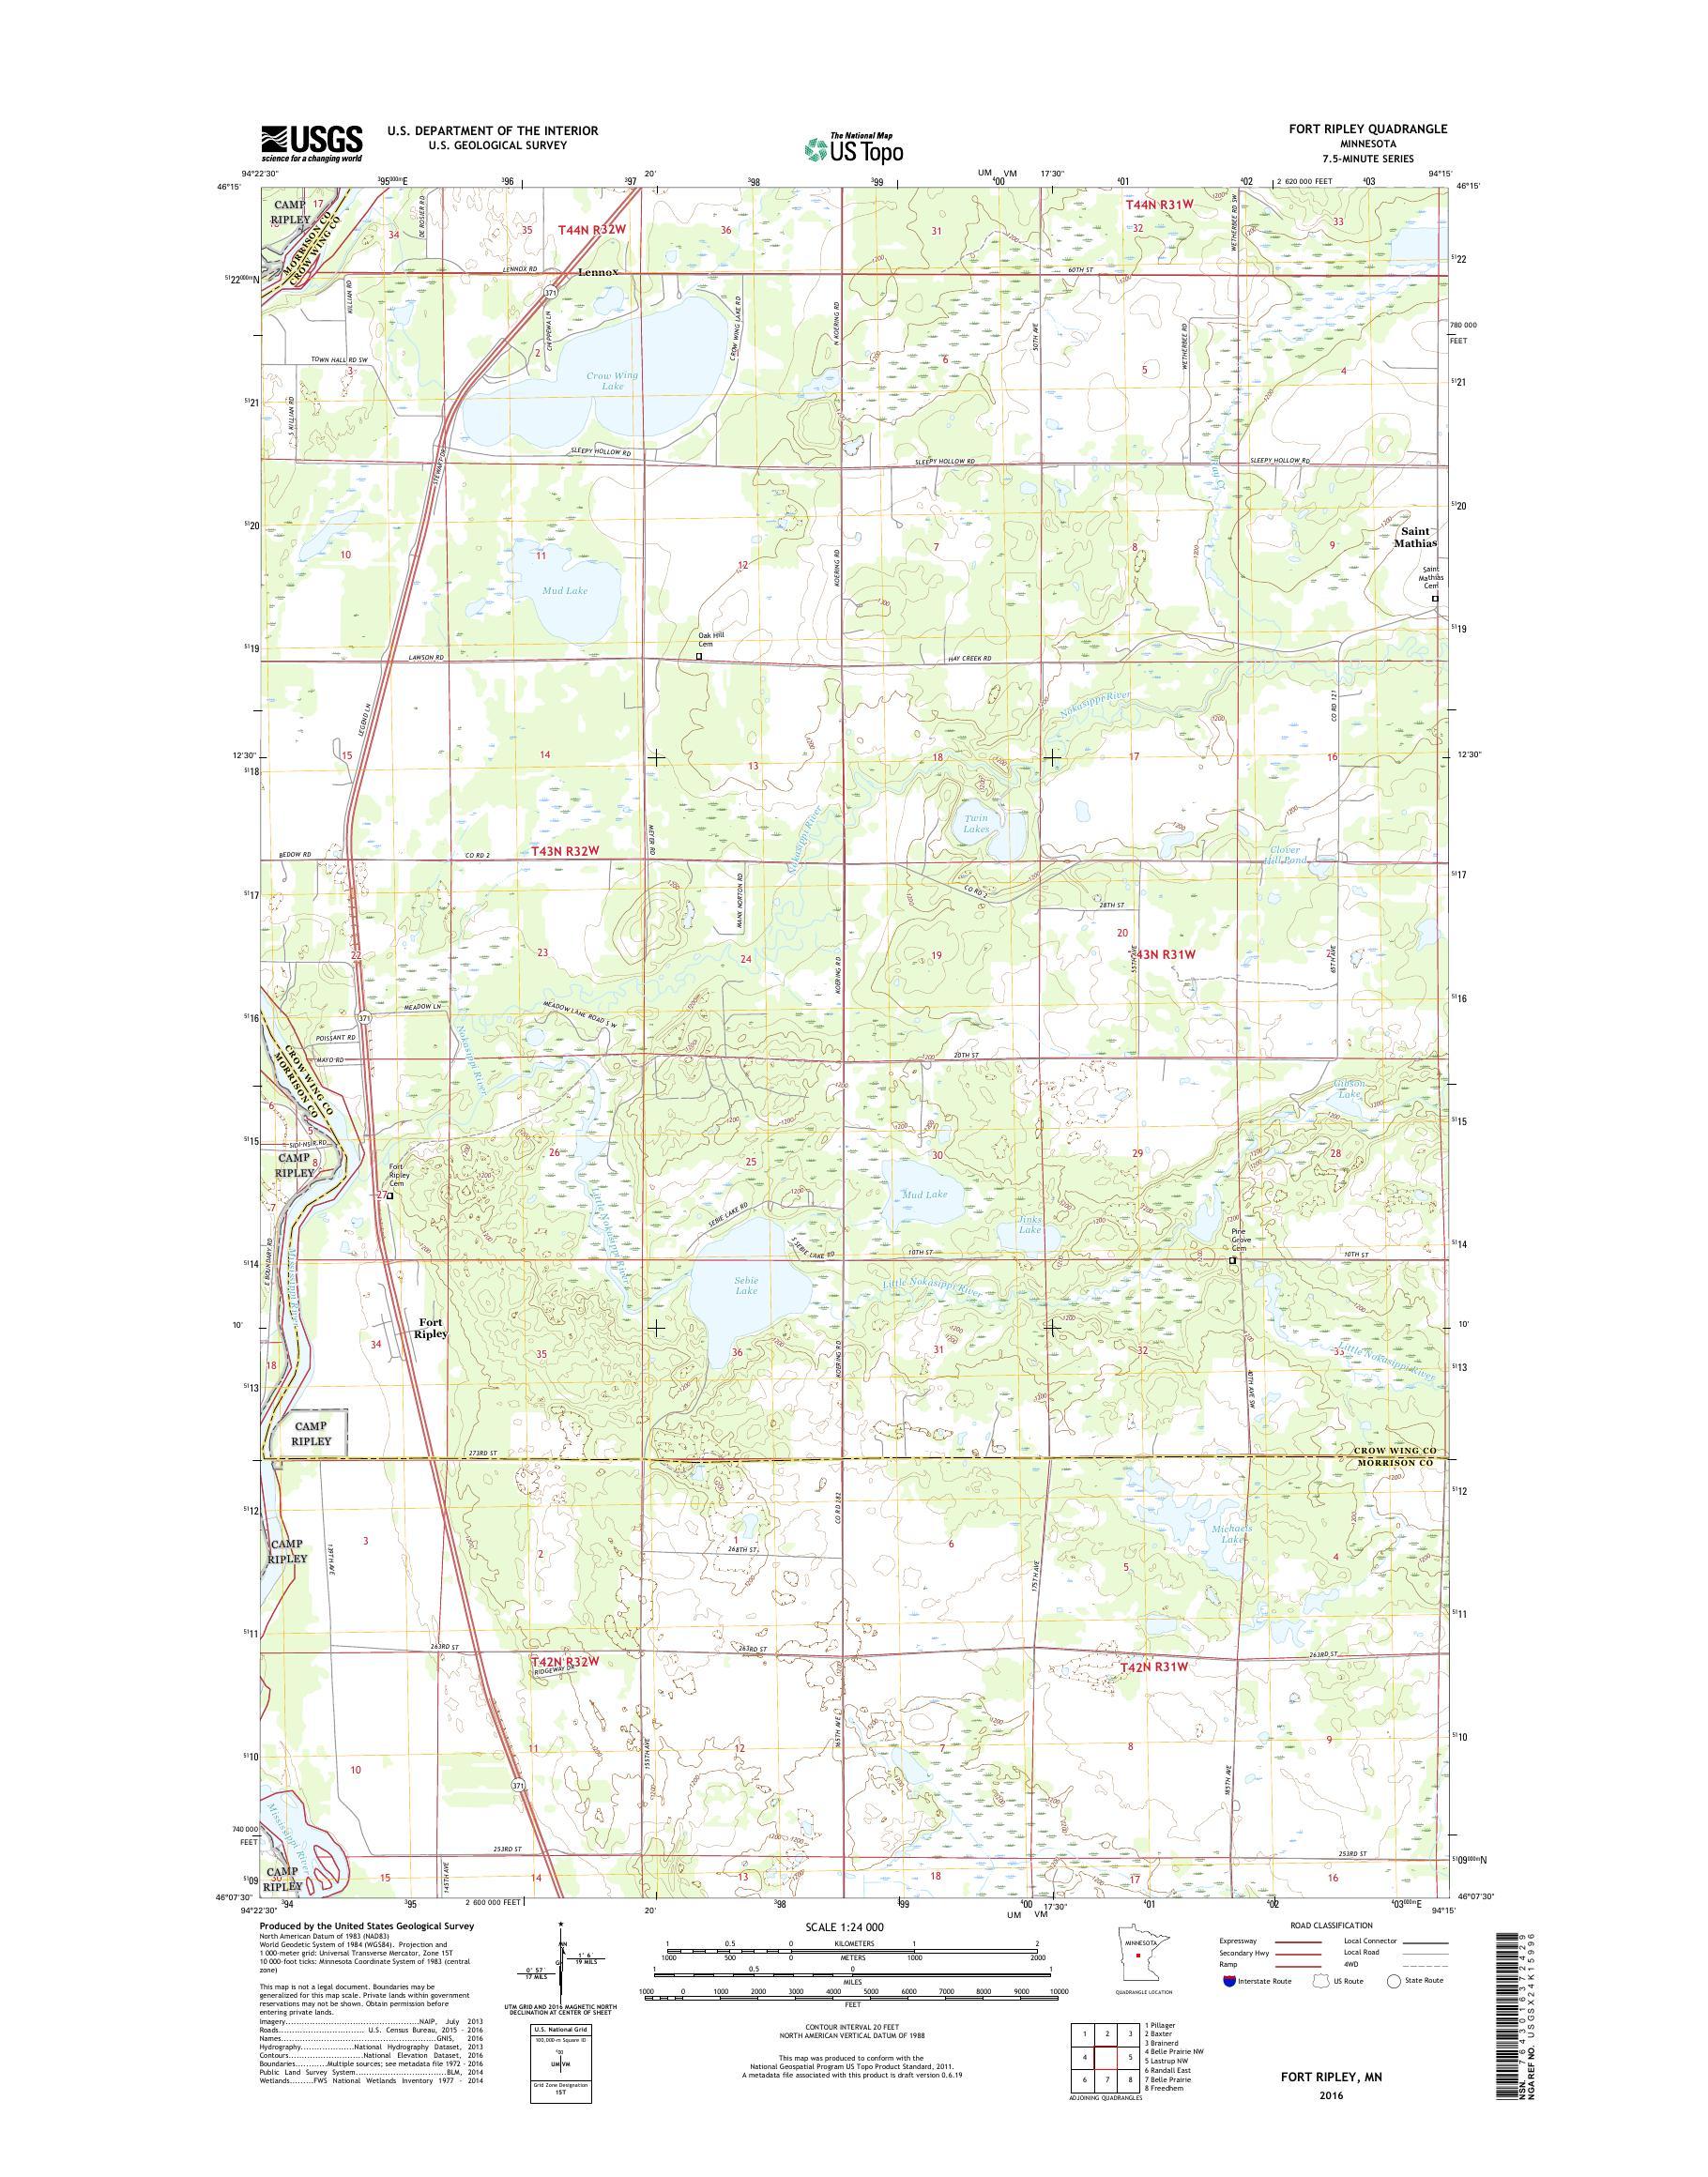 MyTopo Fort Ripley, Minnesota USGS Quad Topo Map on camp san luis obispo map, camp grayling map, fort bridger map, camp parsons map, camp ashland map, camp rapid map, camp coniston map, camp butner map,